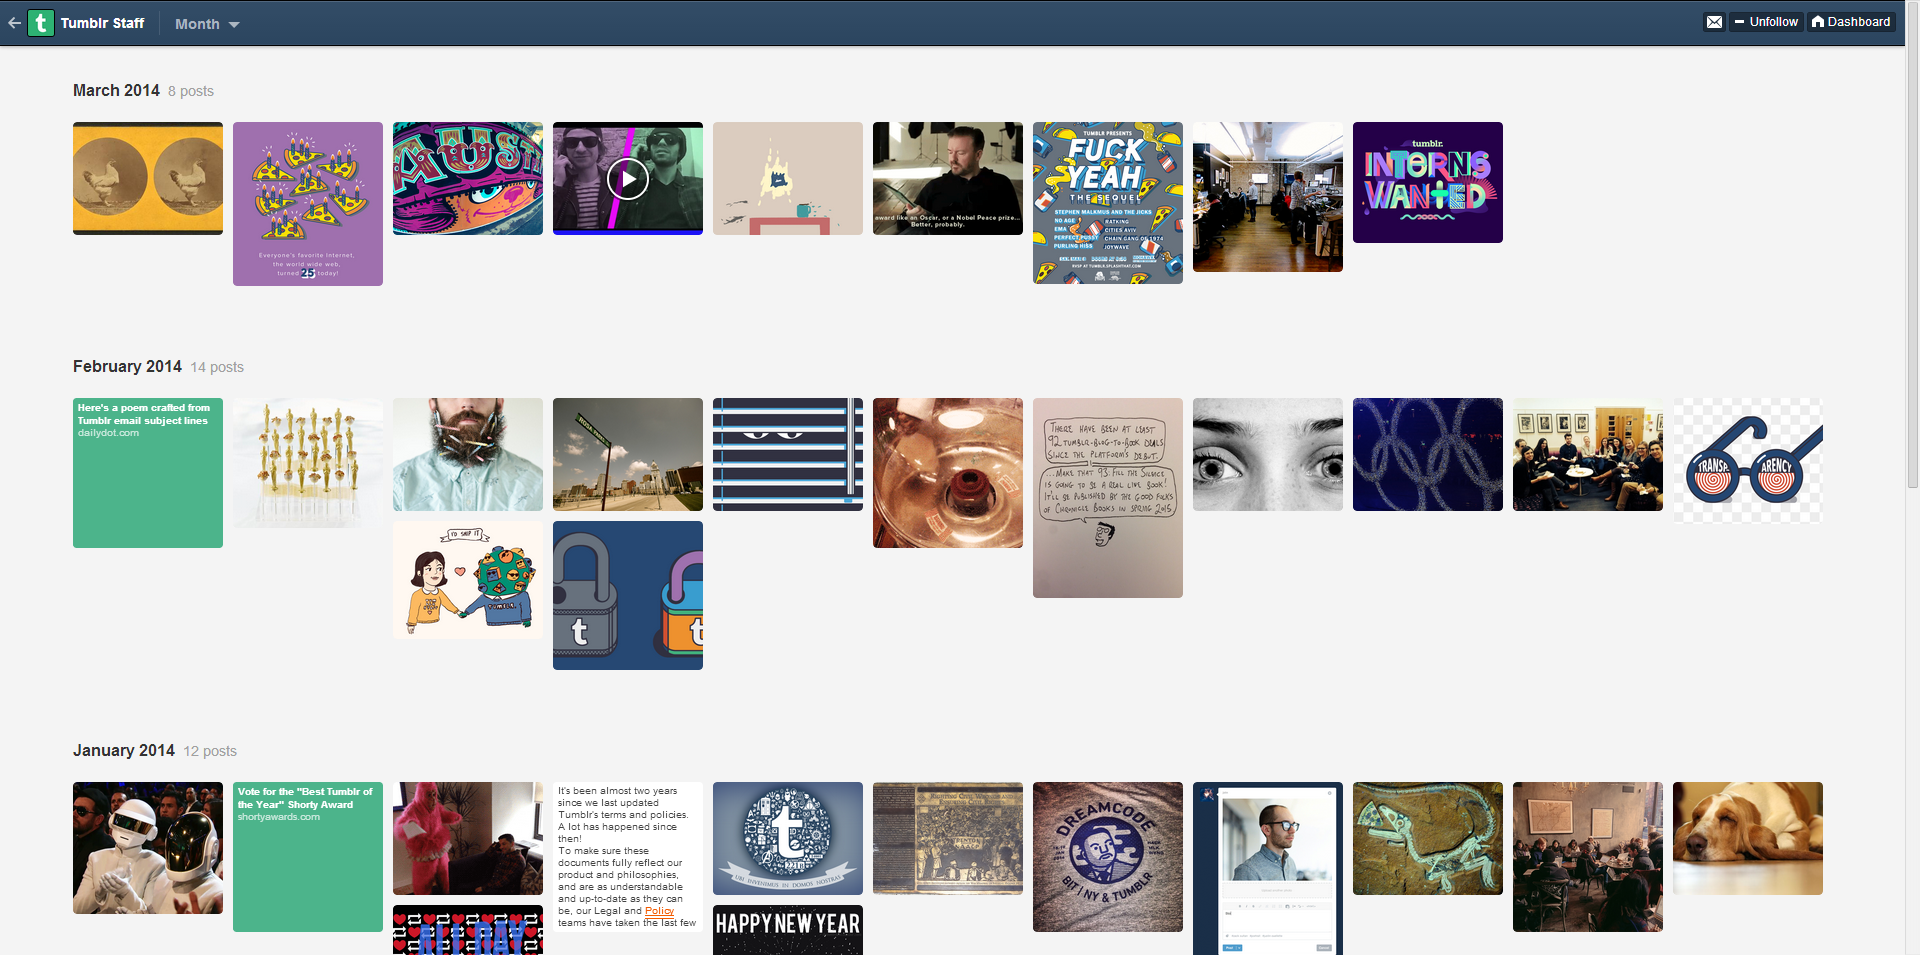 2014-03-19_11_09_15-Tumblr_Staff__Archive